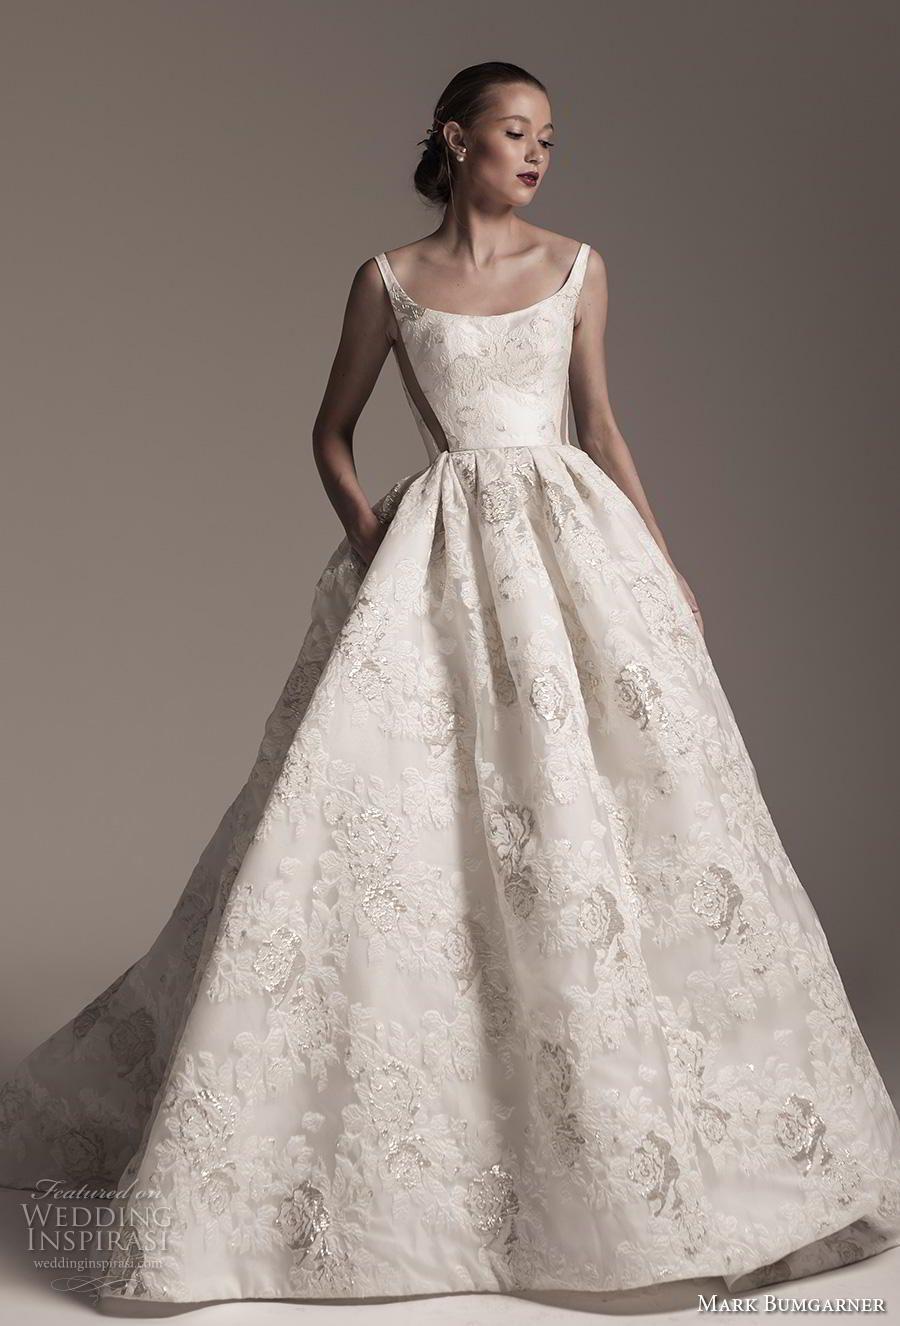 17a27db78b626 mark bumgarner fall 2018 bridal sleeveless thin strap scoop neckline full embellishment  romantic princess ball gown